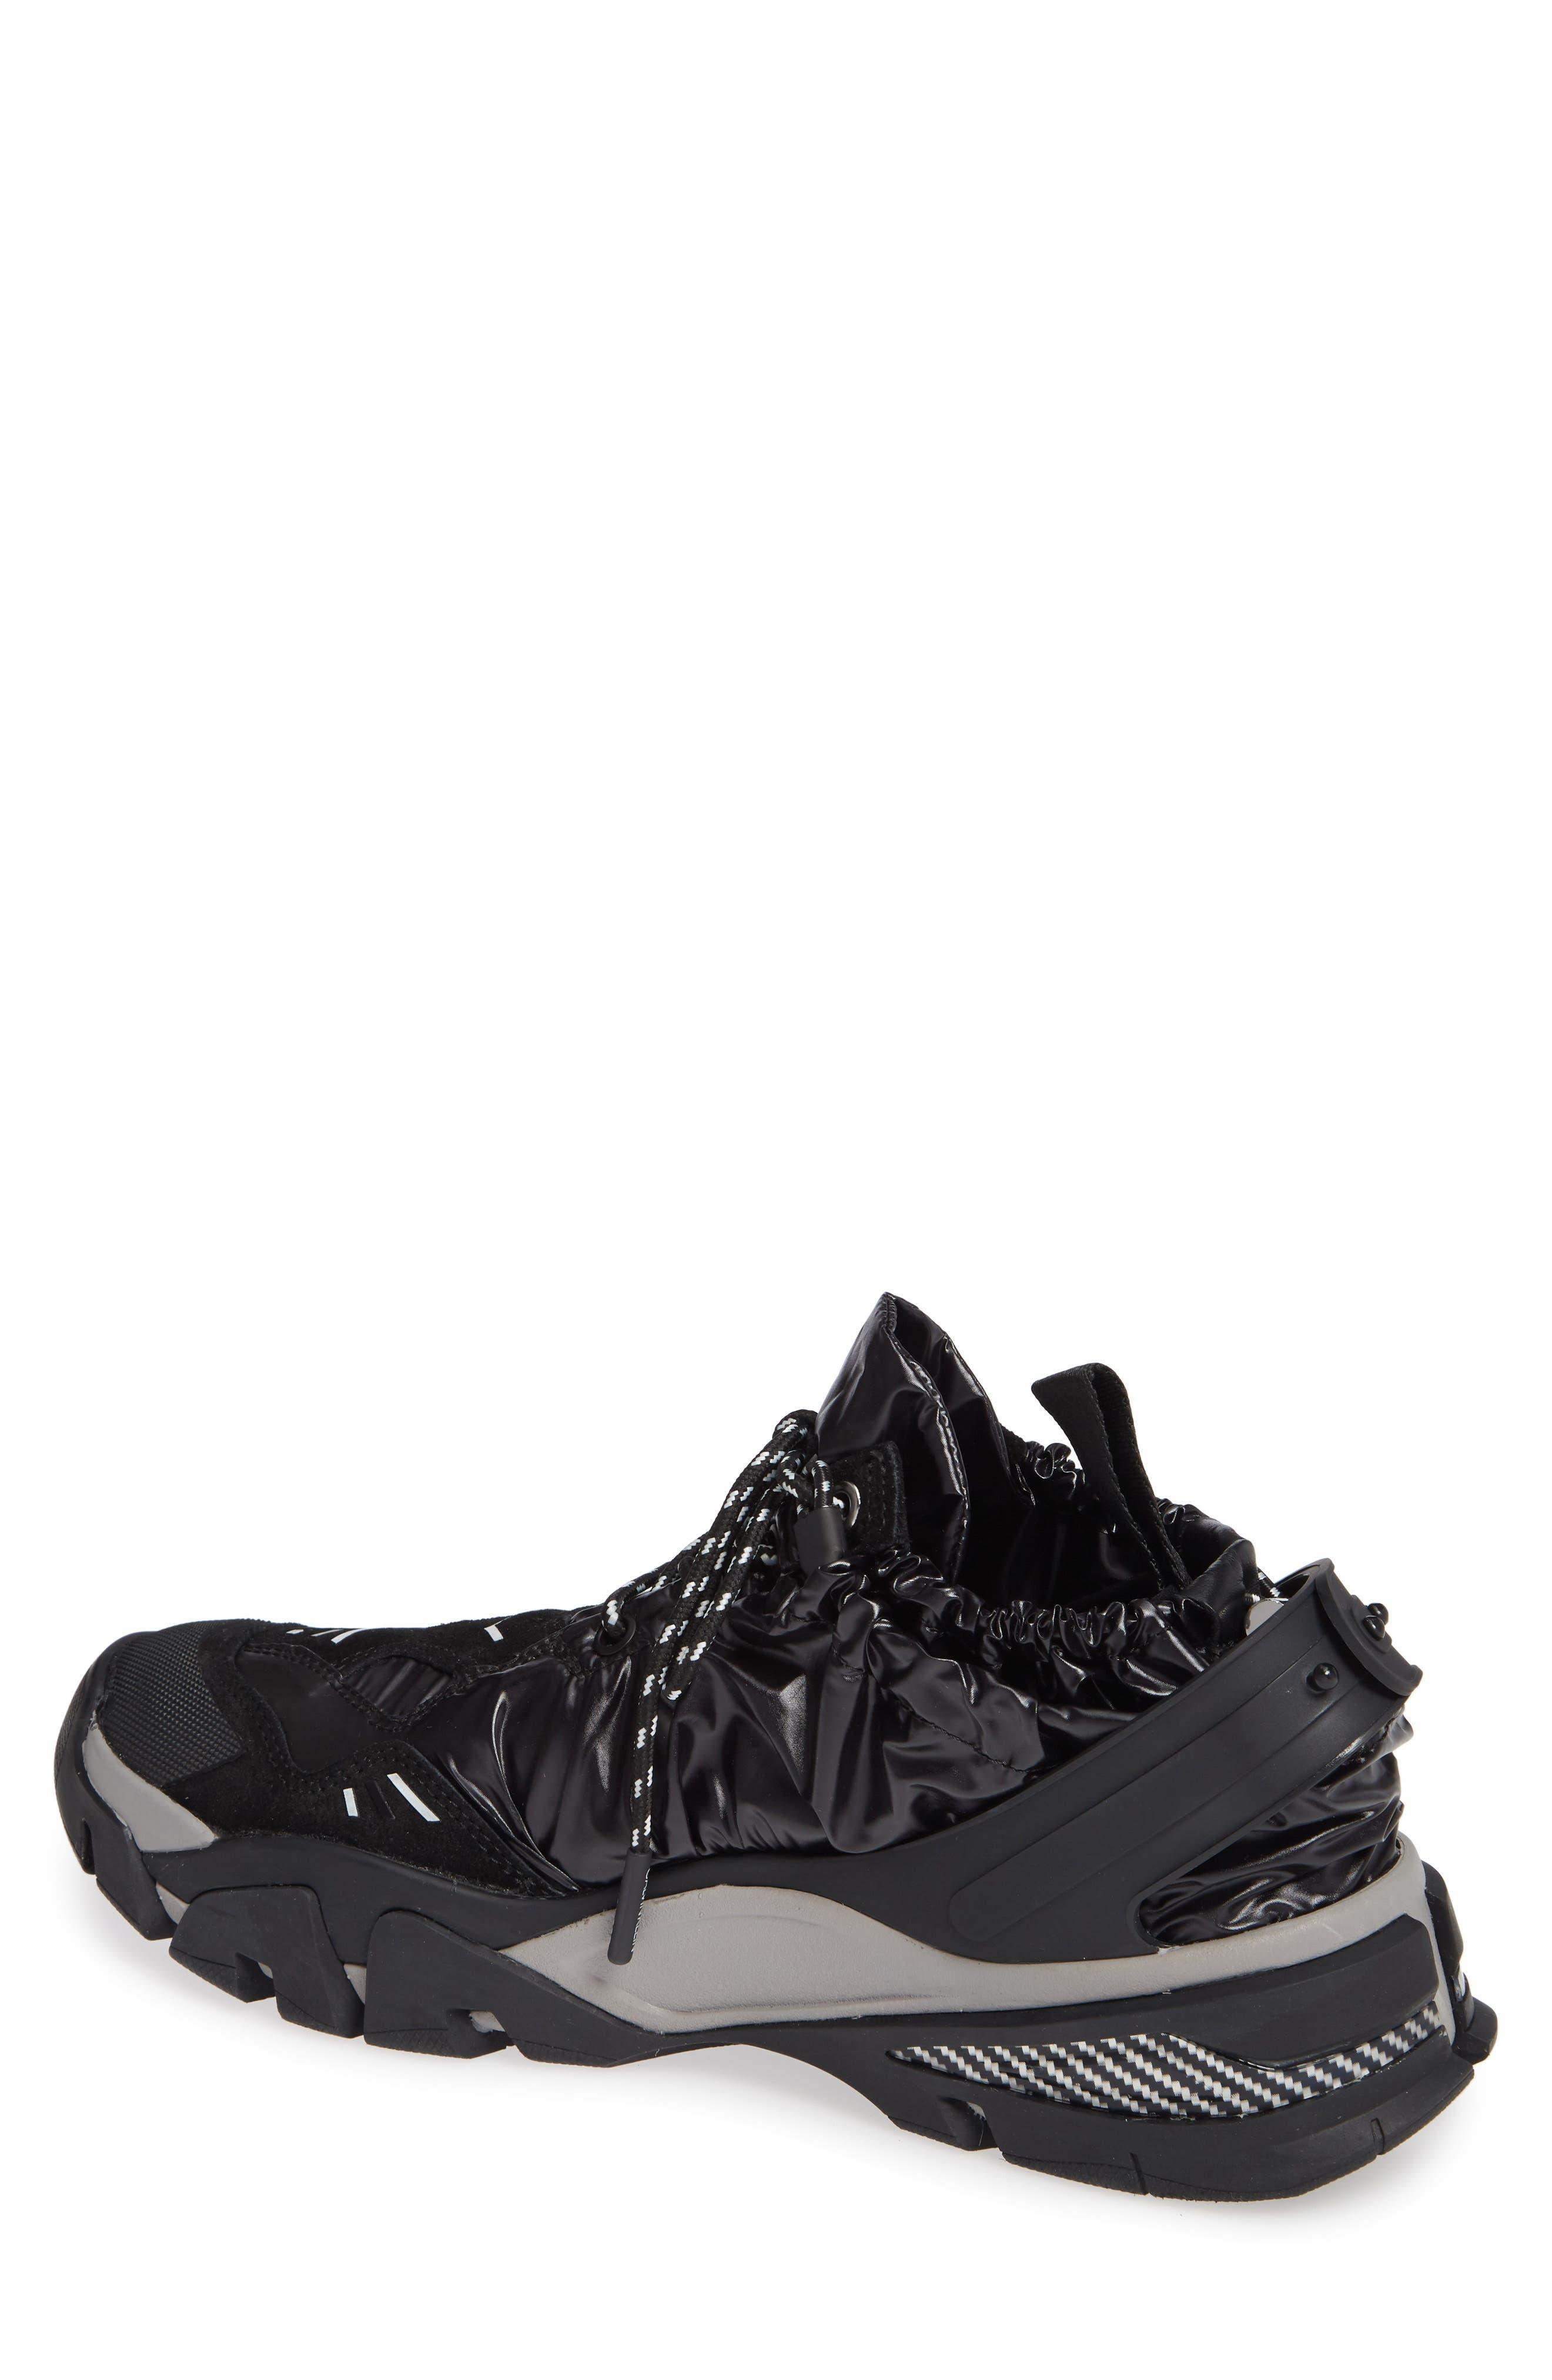 Carsdat 10 Elastic Sneaker,                             Alternate thumbnail 2, color,                             BLACK